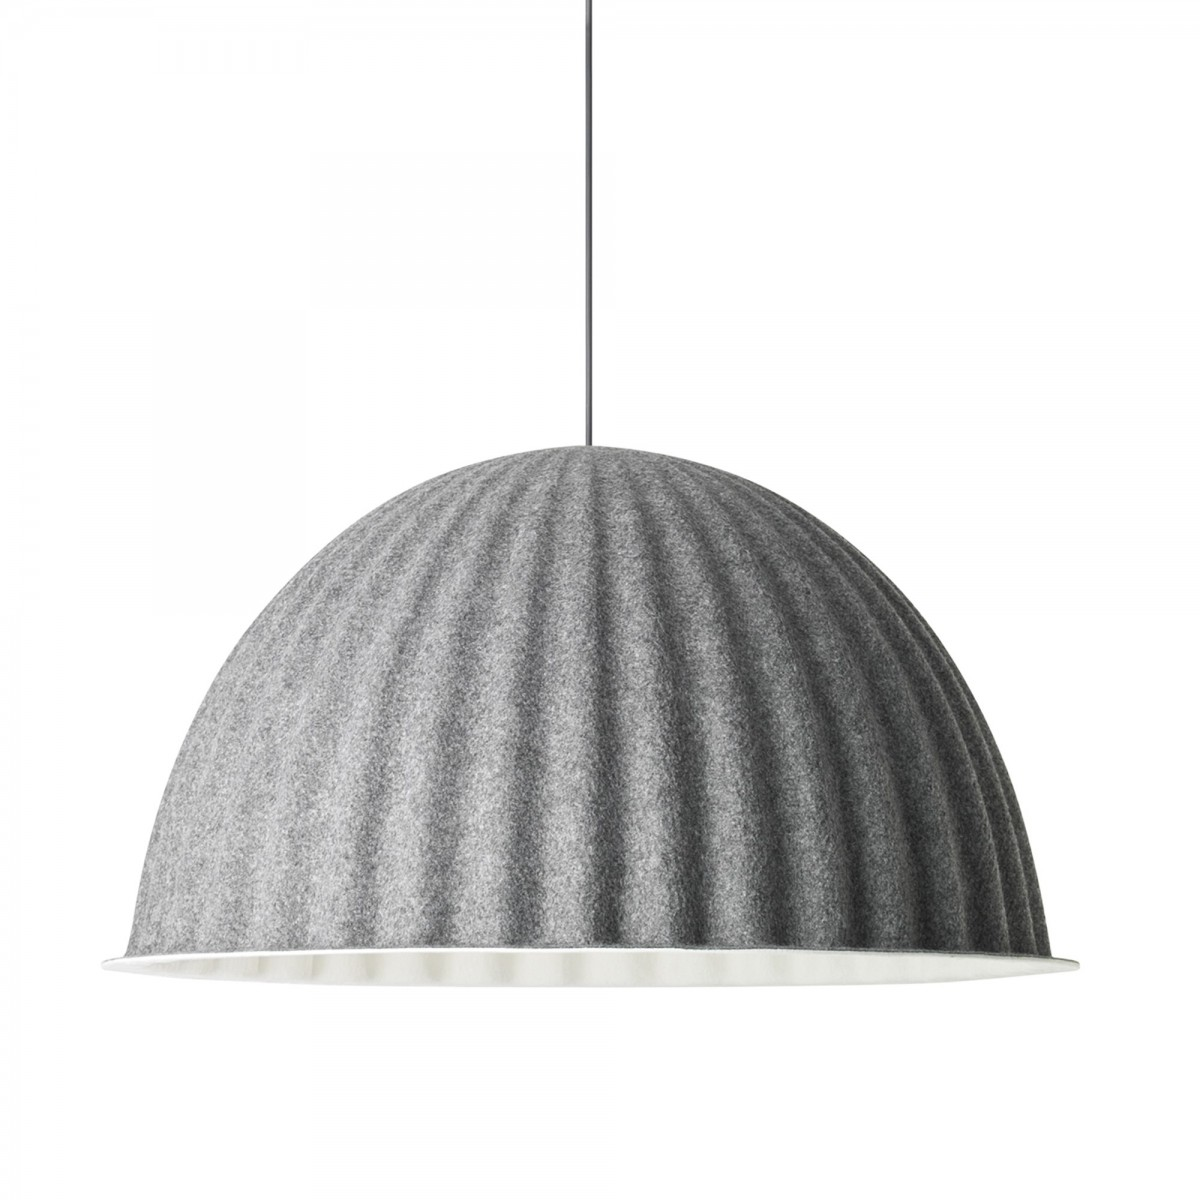 Topp UNDER THE BELL pendant lamp in grey acoustic felt - MUUTO JF-08